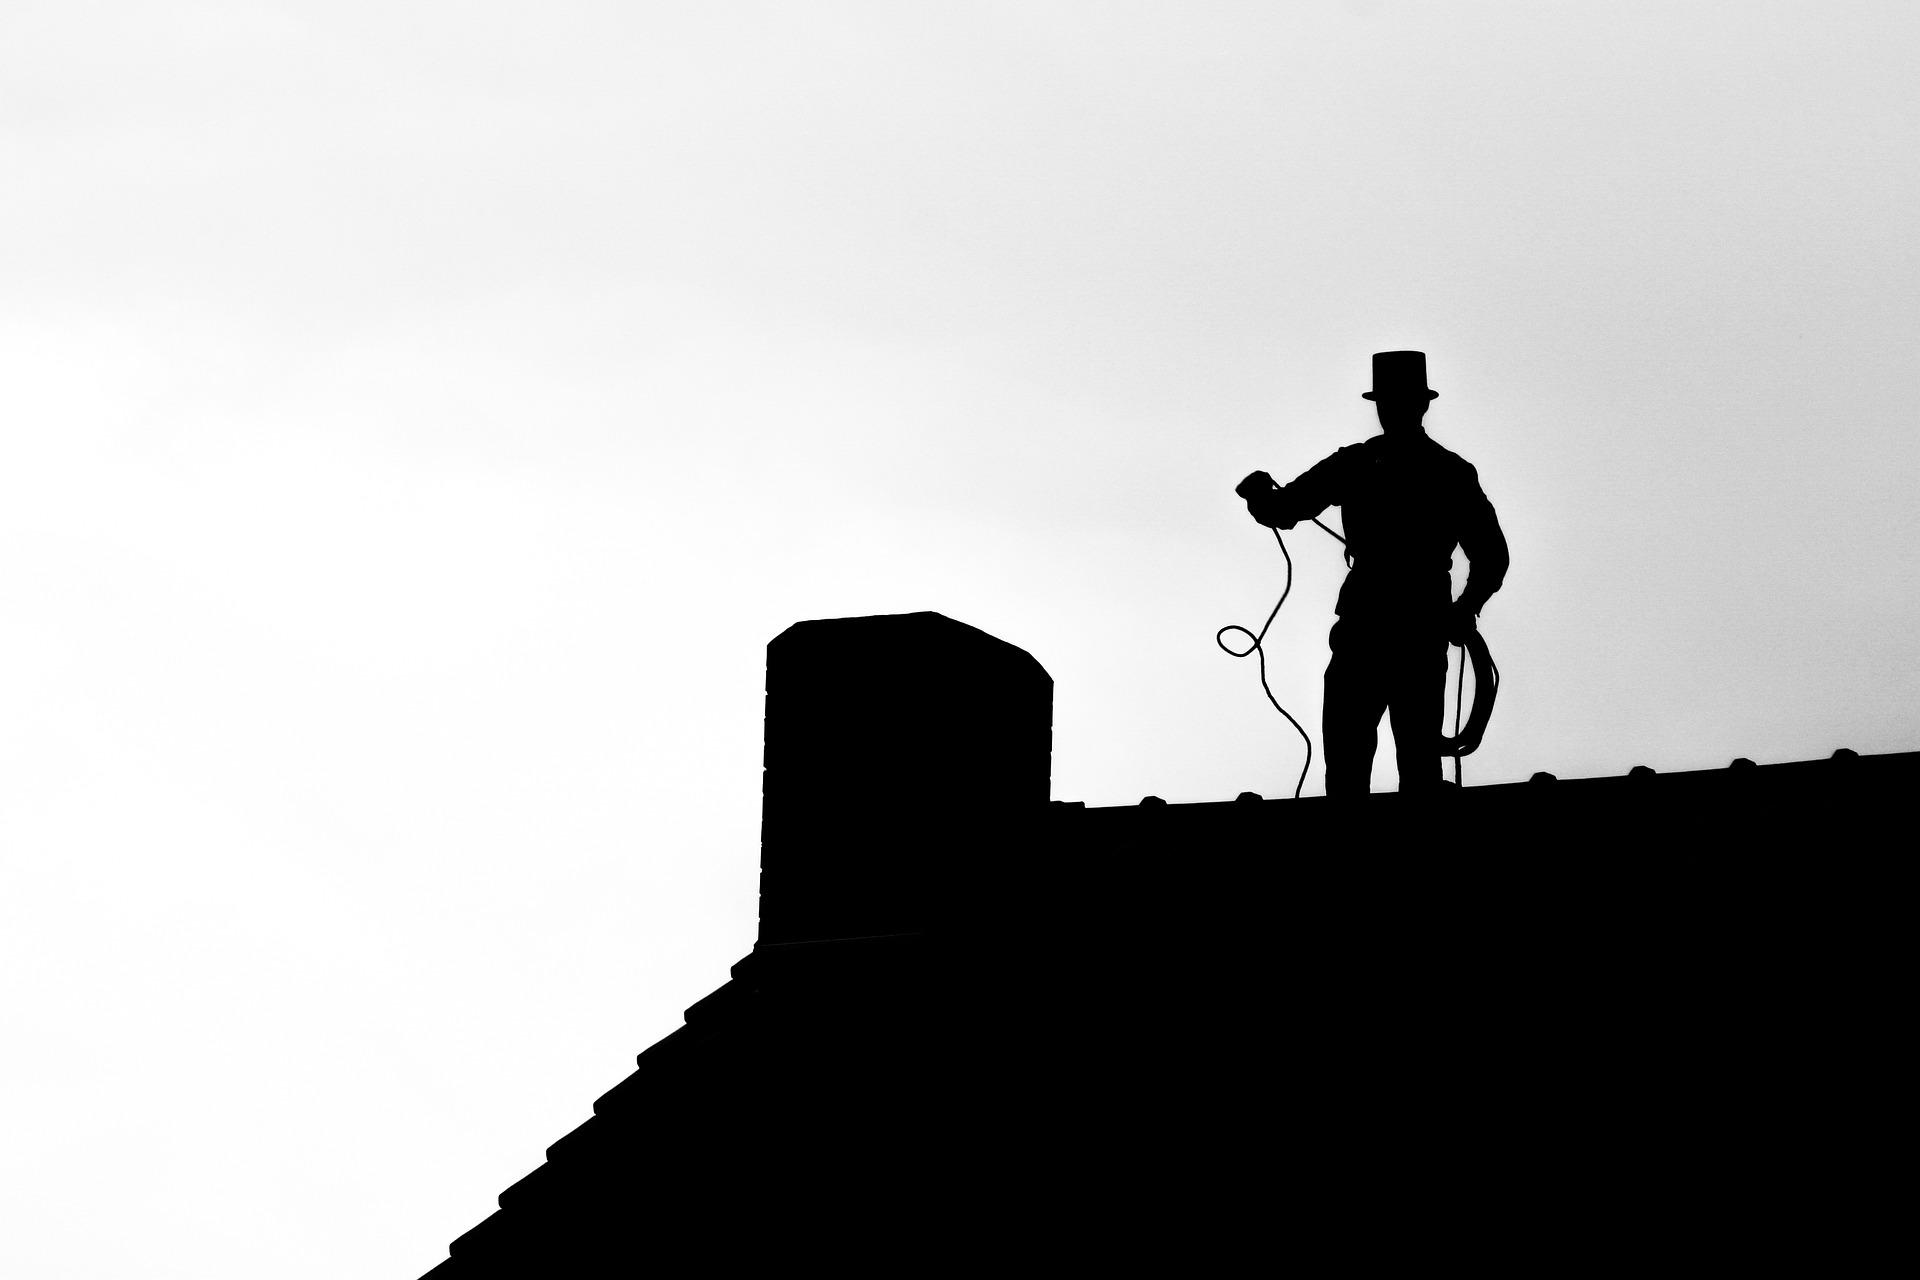 chimney-sweep-2792895_1920